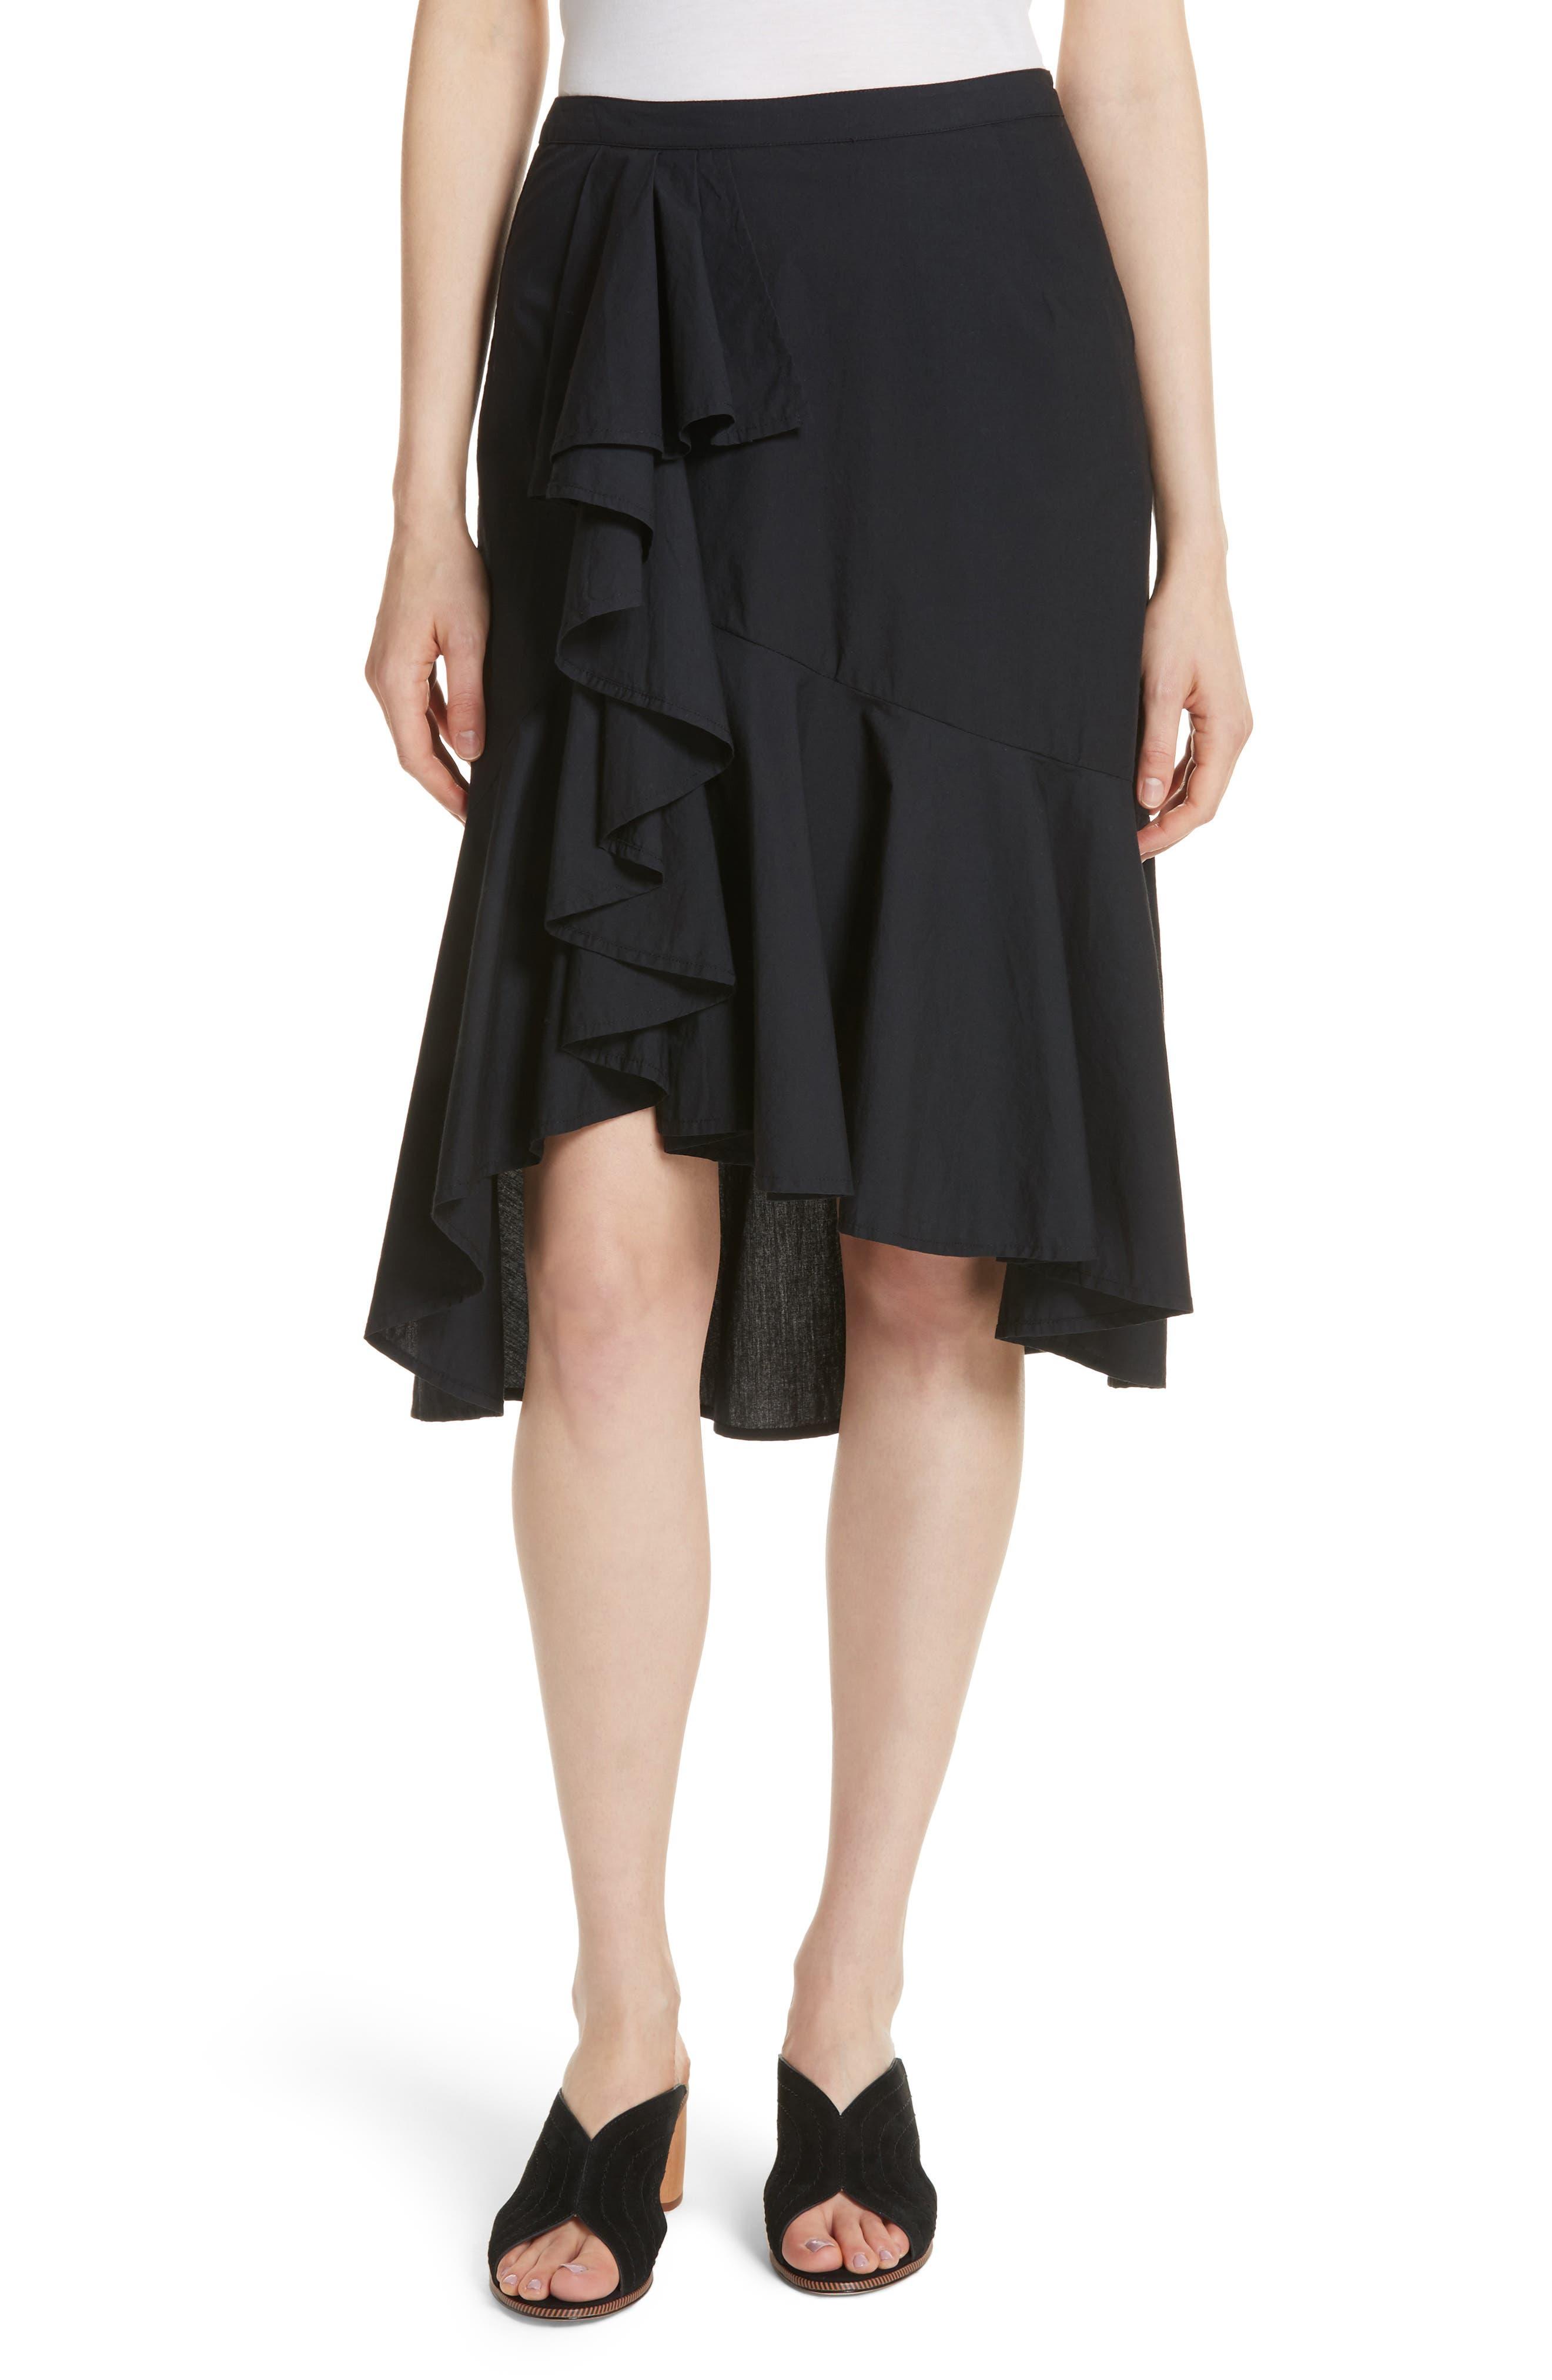 Chesmu Ruffled Cotton Skirt,                             Main thumbnail 1, color,                             001